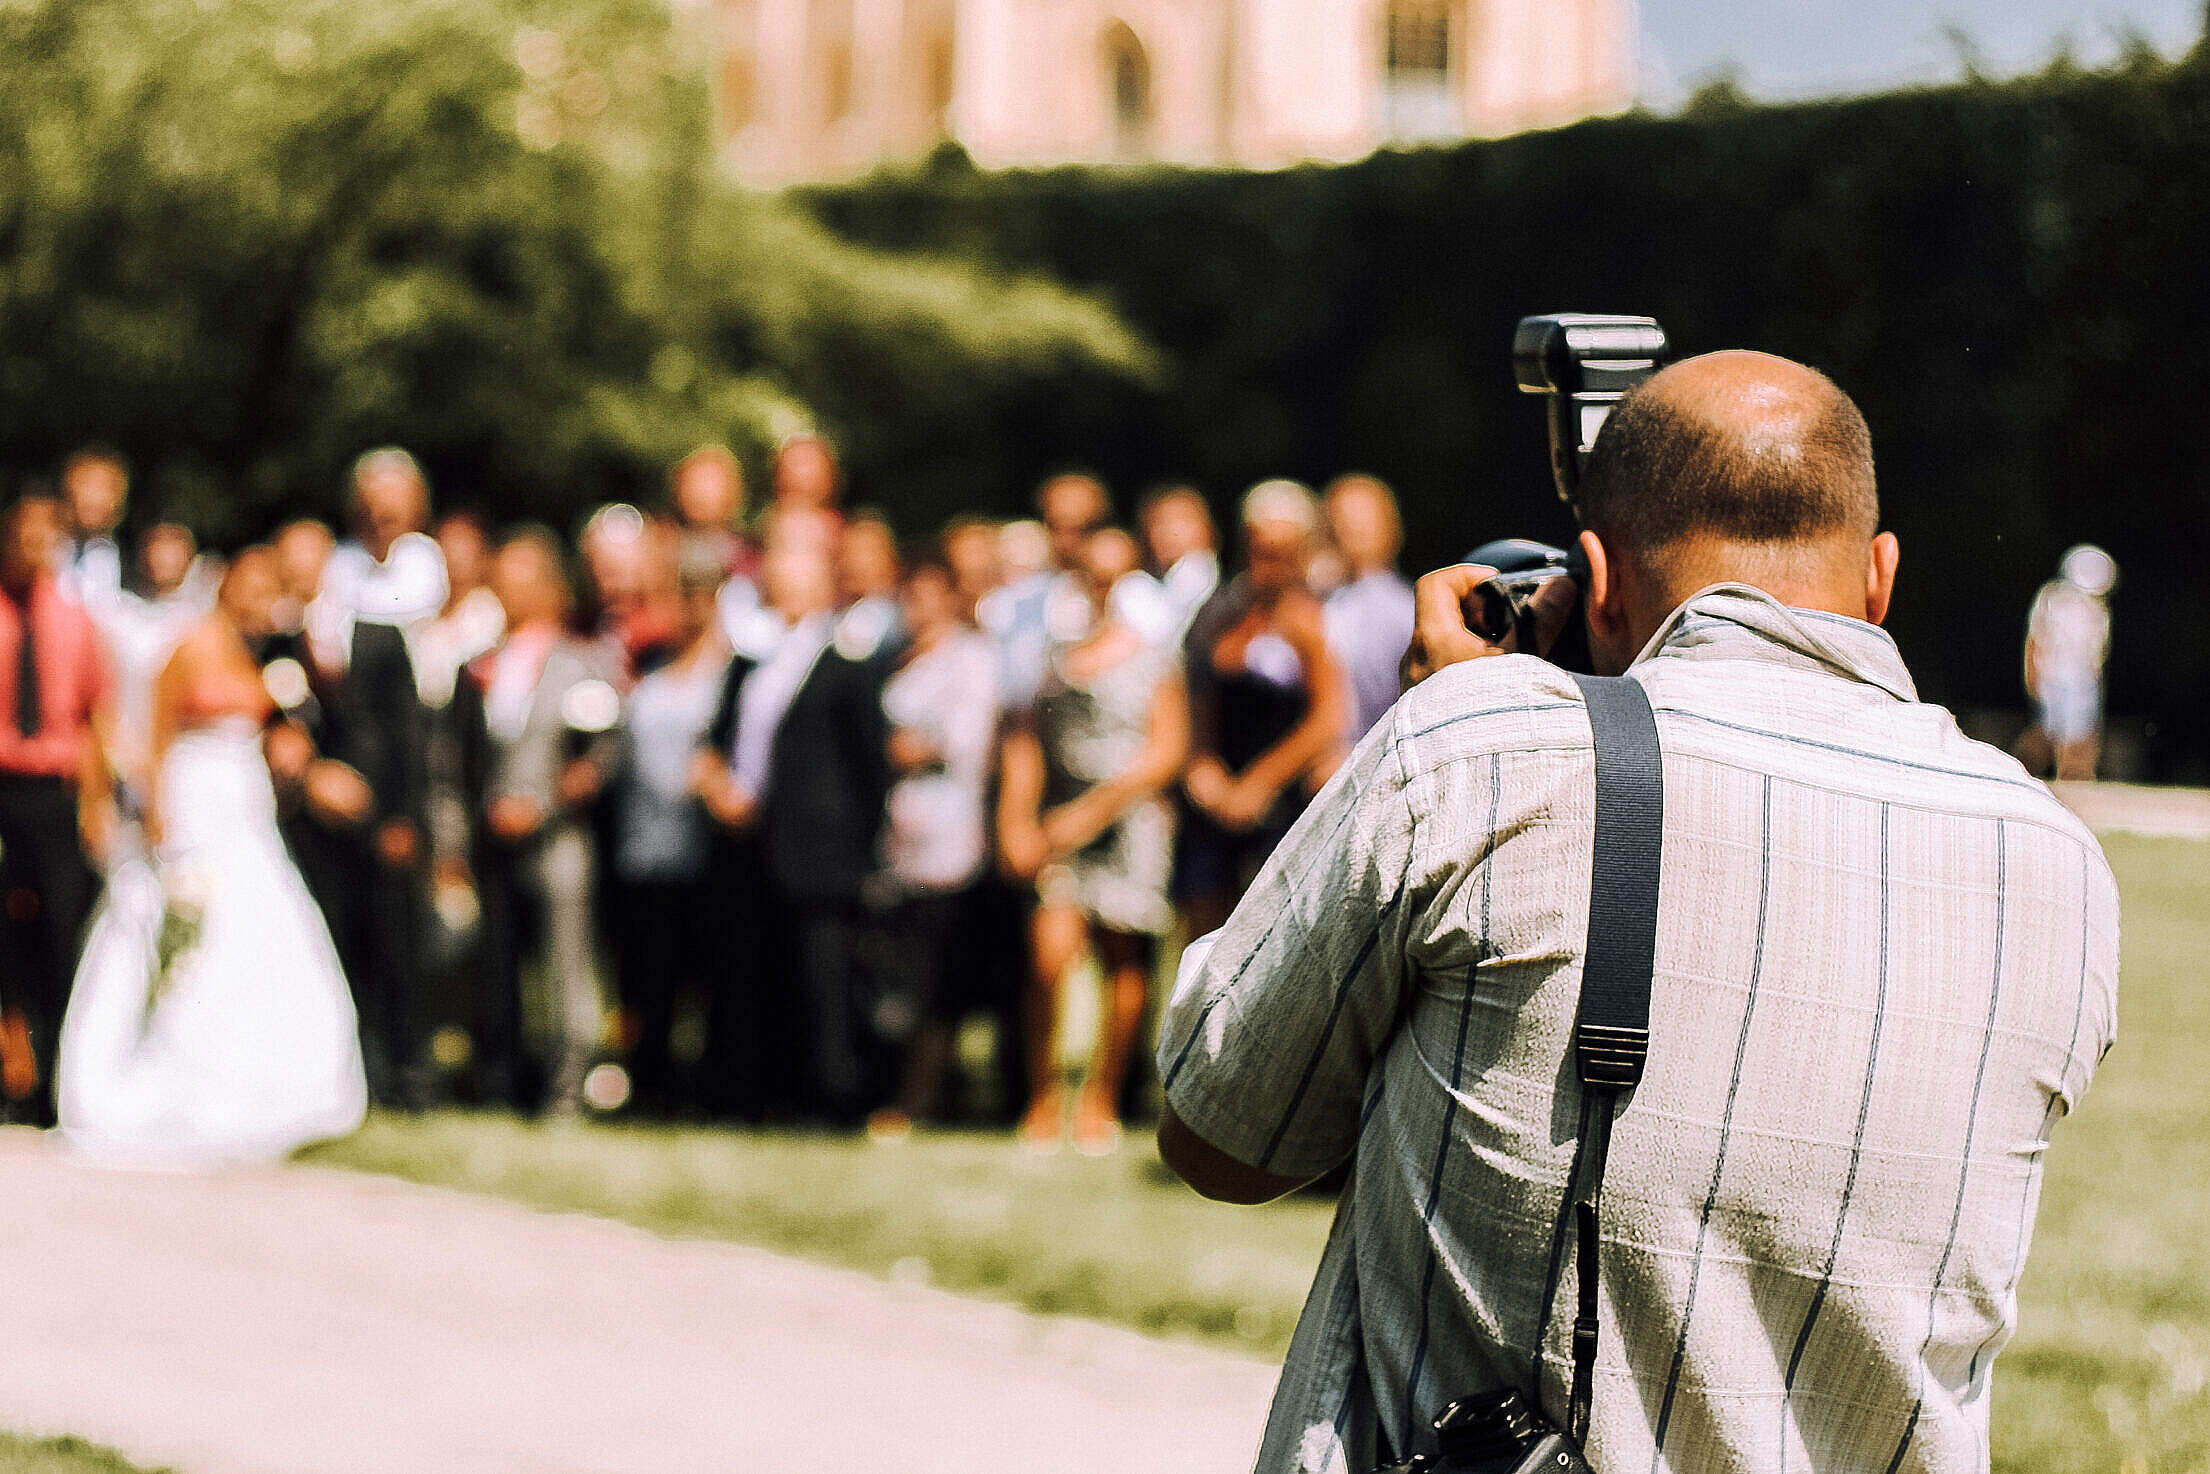 Wedding Photographer in Action Free Stock Photo